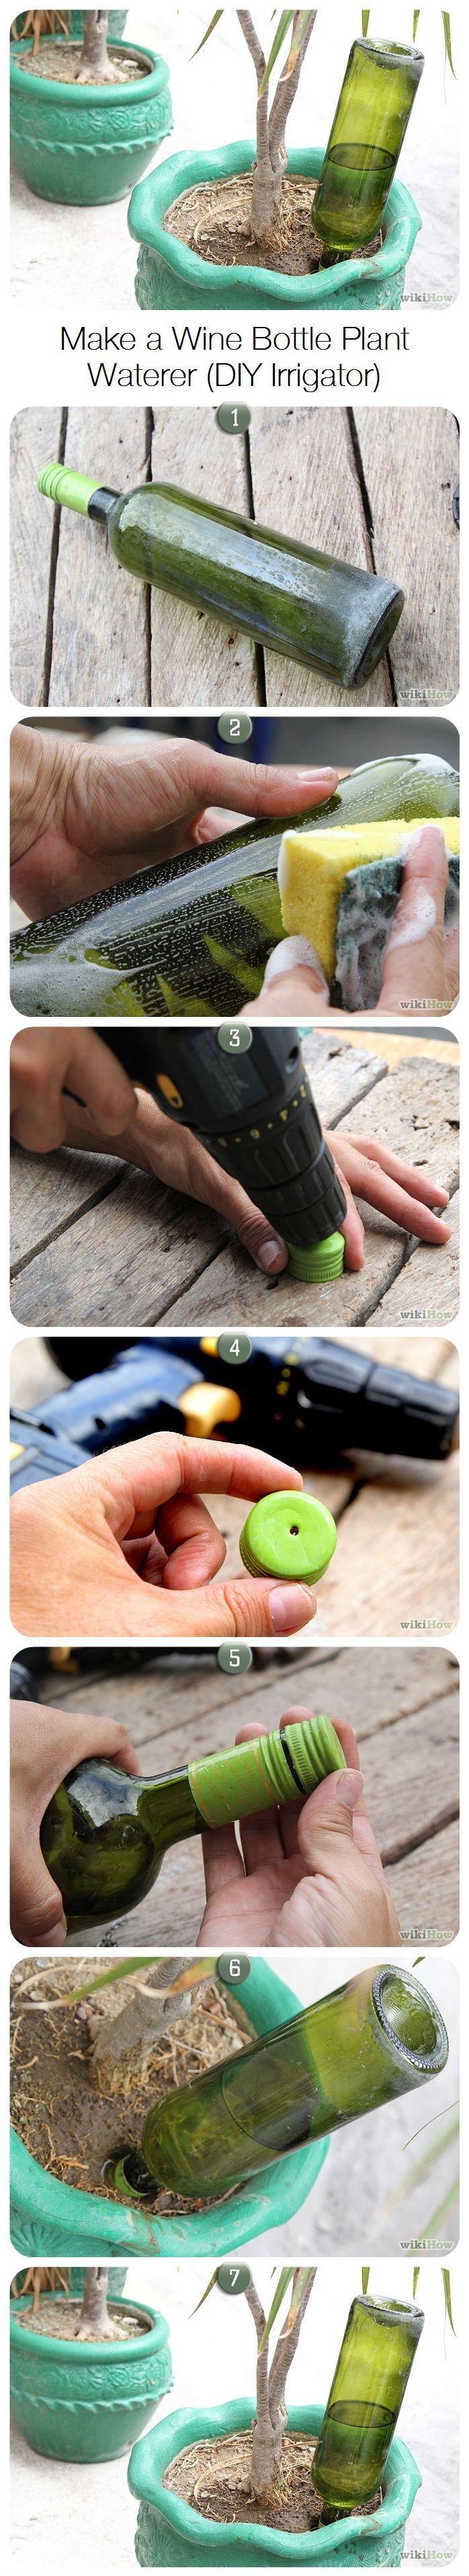 make wine bottle plant waterer